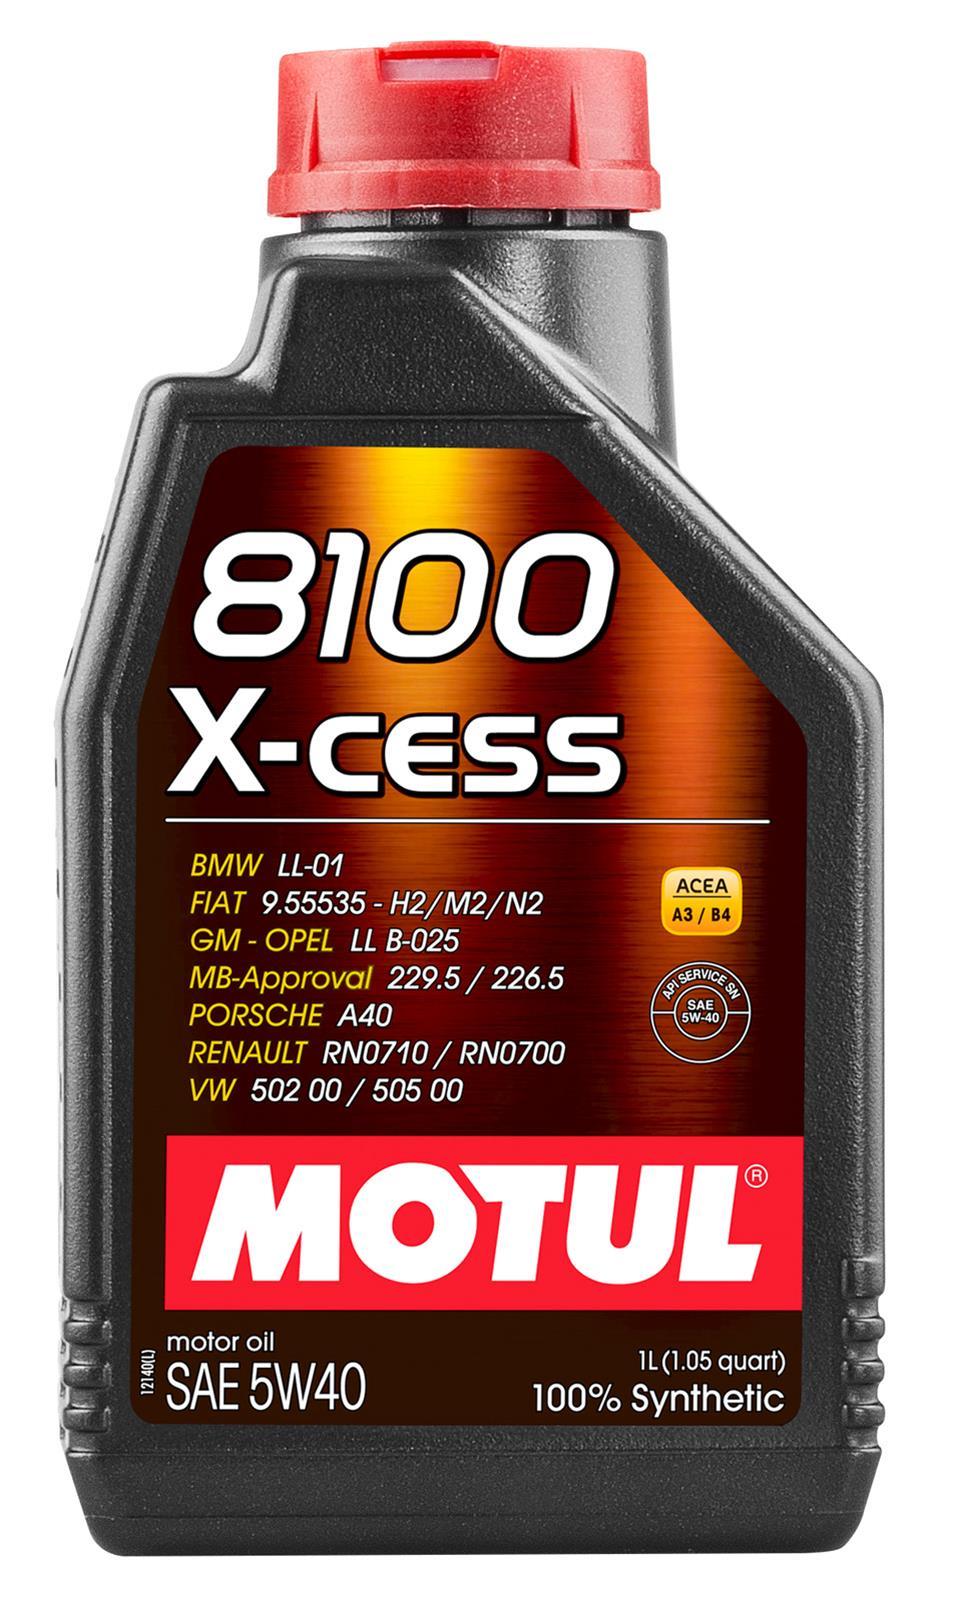 medium resolution of motul 8100 x cess motor oil 102784 free shipping on orders over 99 at summit racing